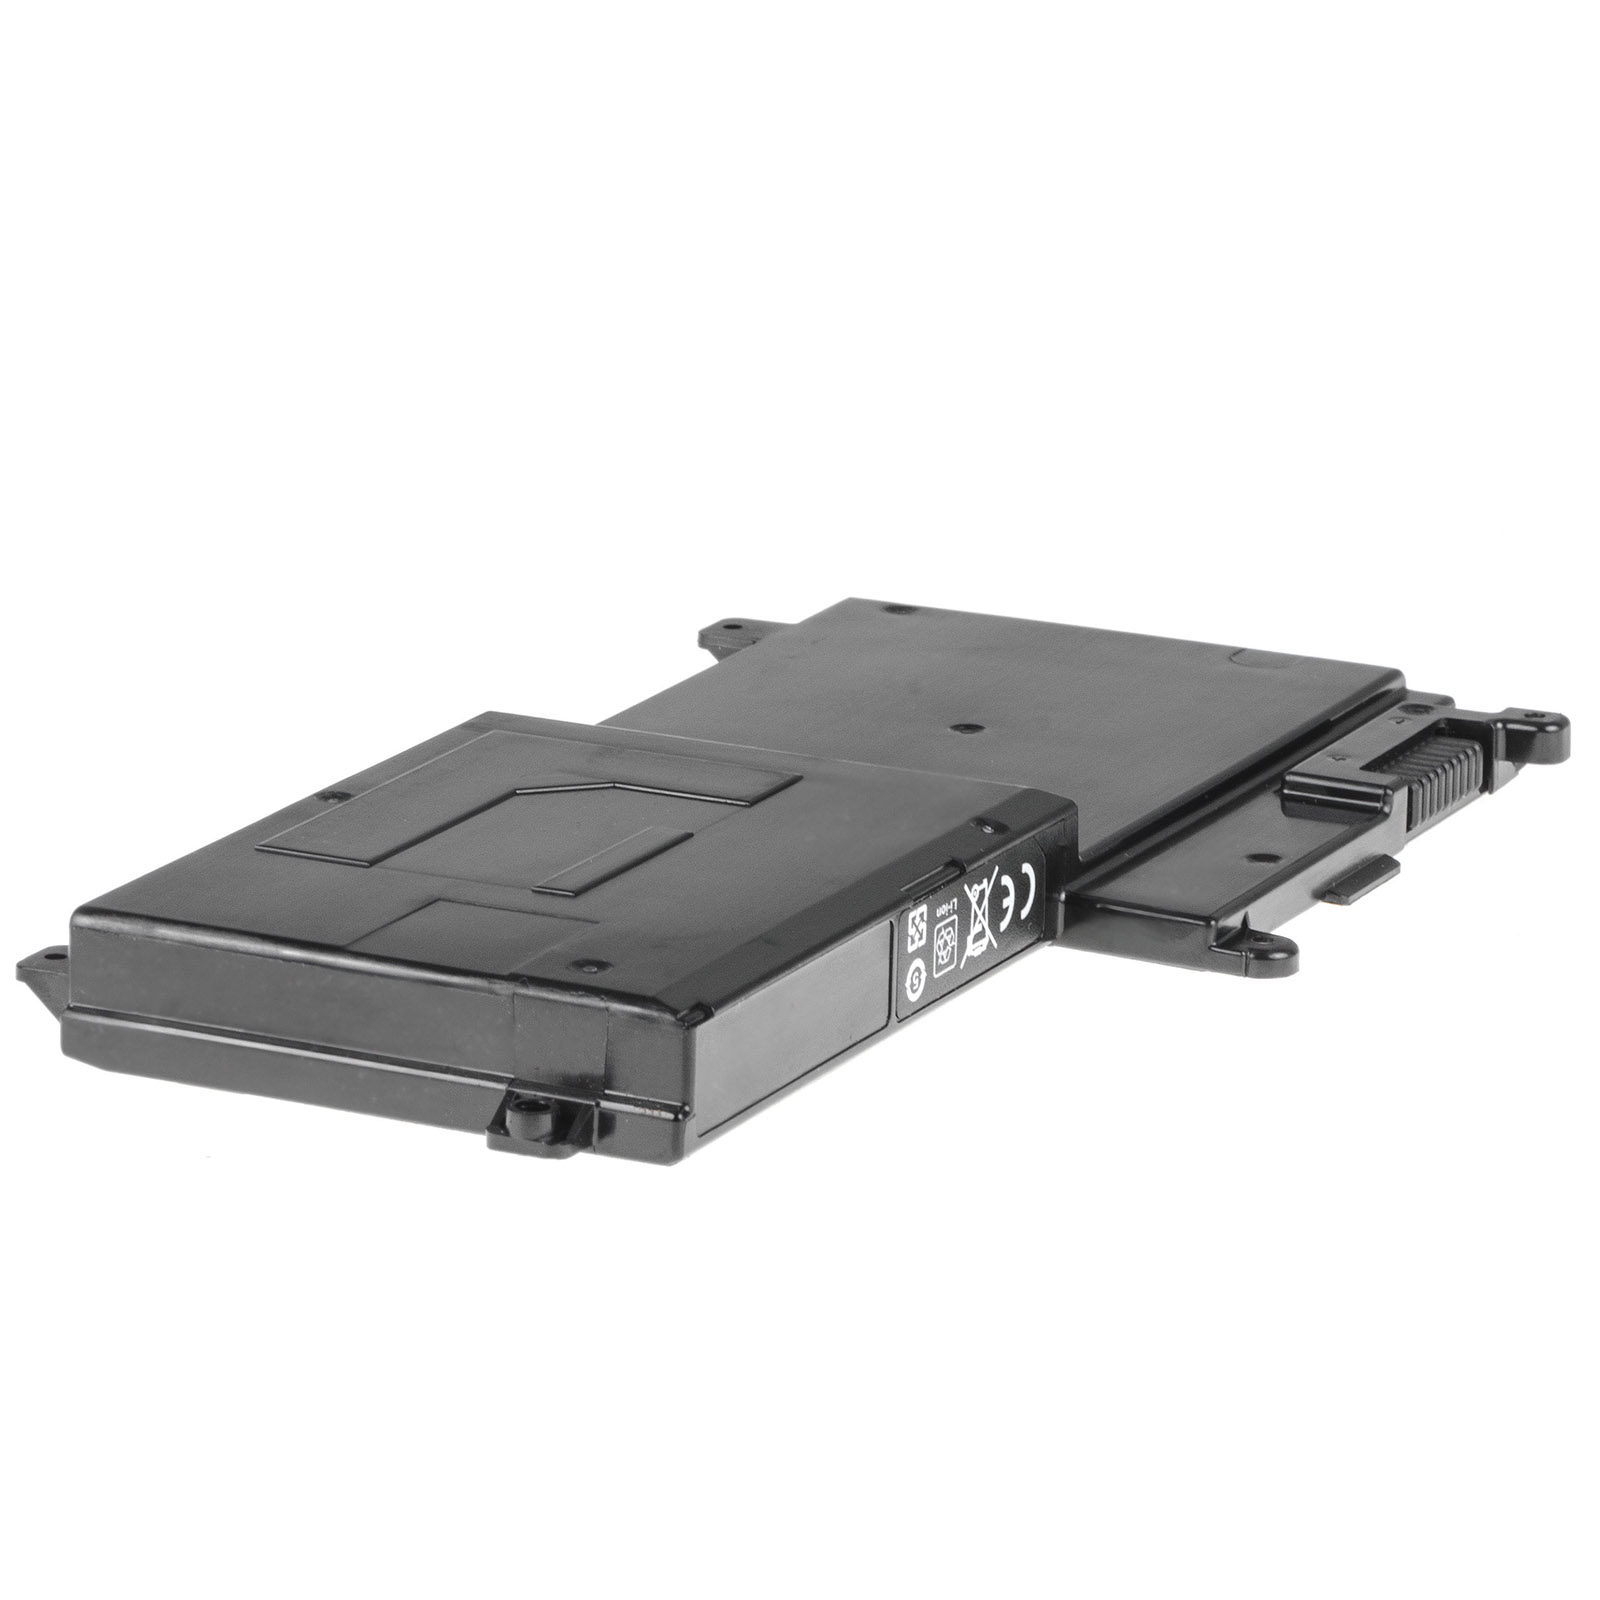 hp probook 640 g2 manual